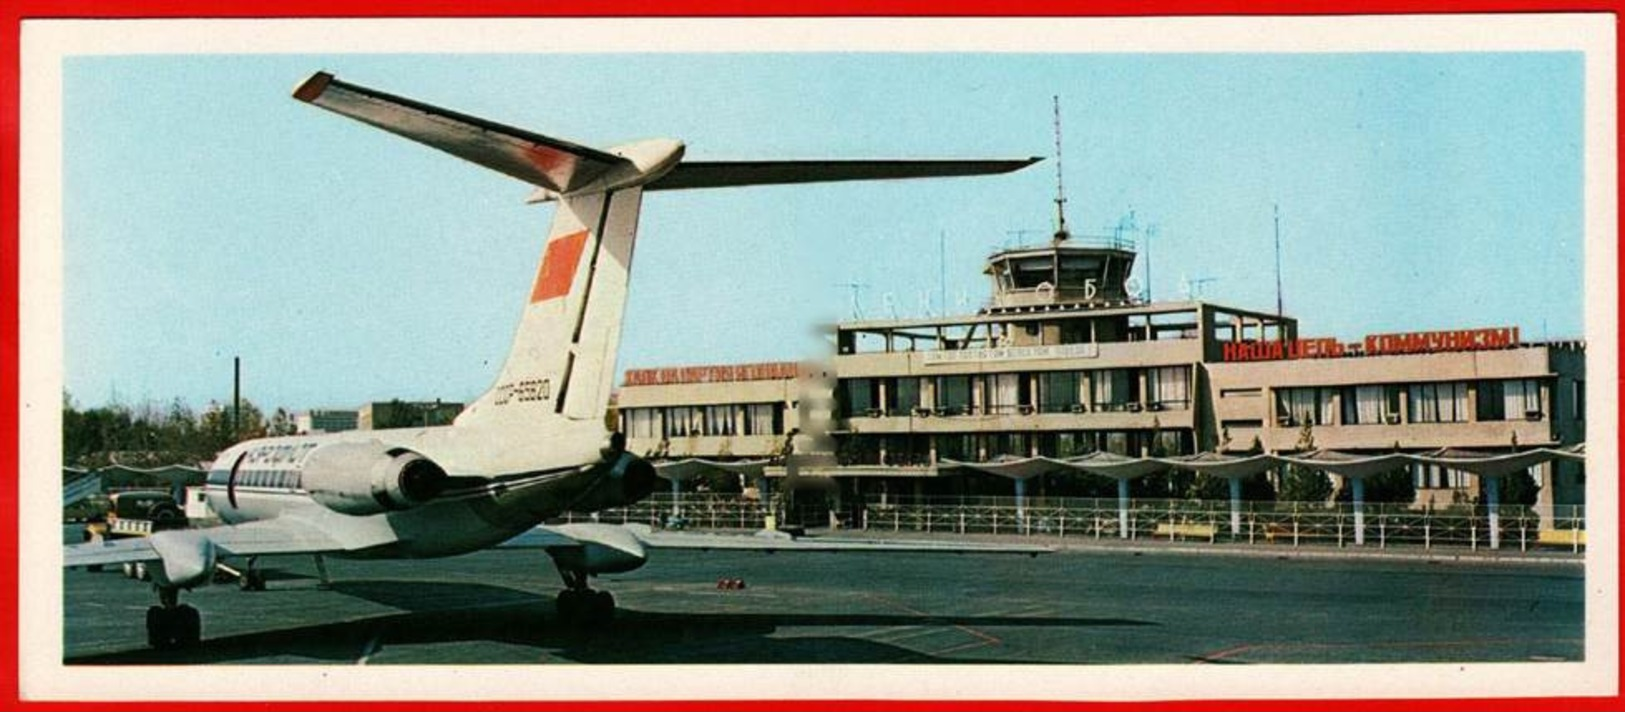 Leninabad Aéroport Terminal De L'aéroport Slogan De L'aérogare De L'aéroport Tajikistan Tajik - Tadjikistan